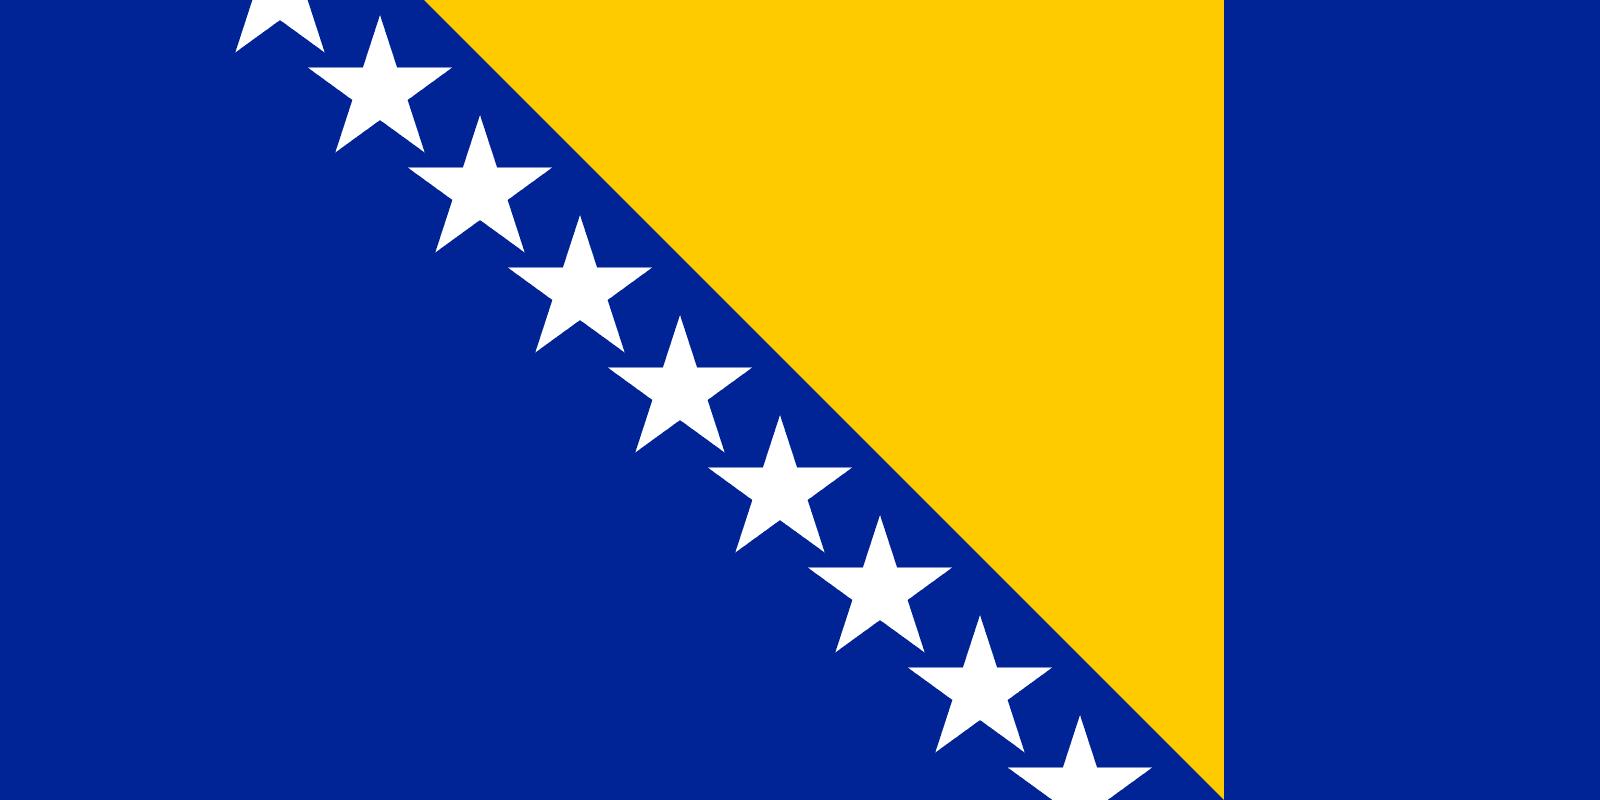 Flag Of Bosnia And Herzegovina Flagpedia Net